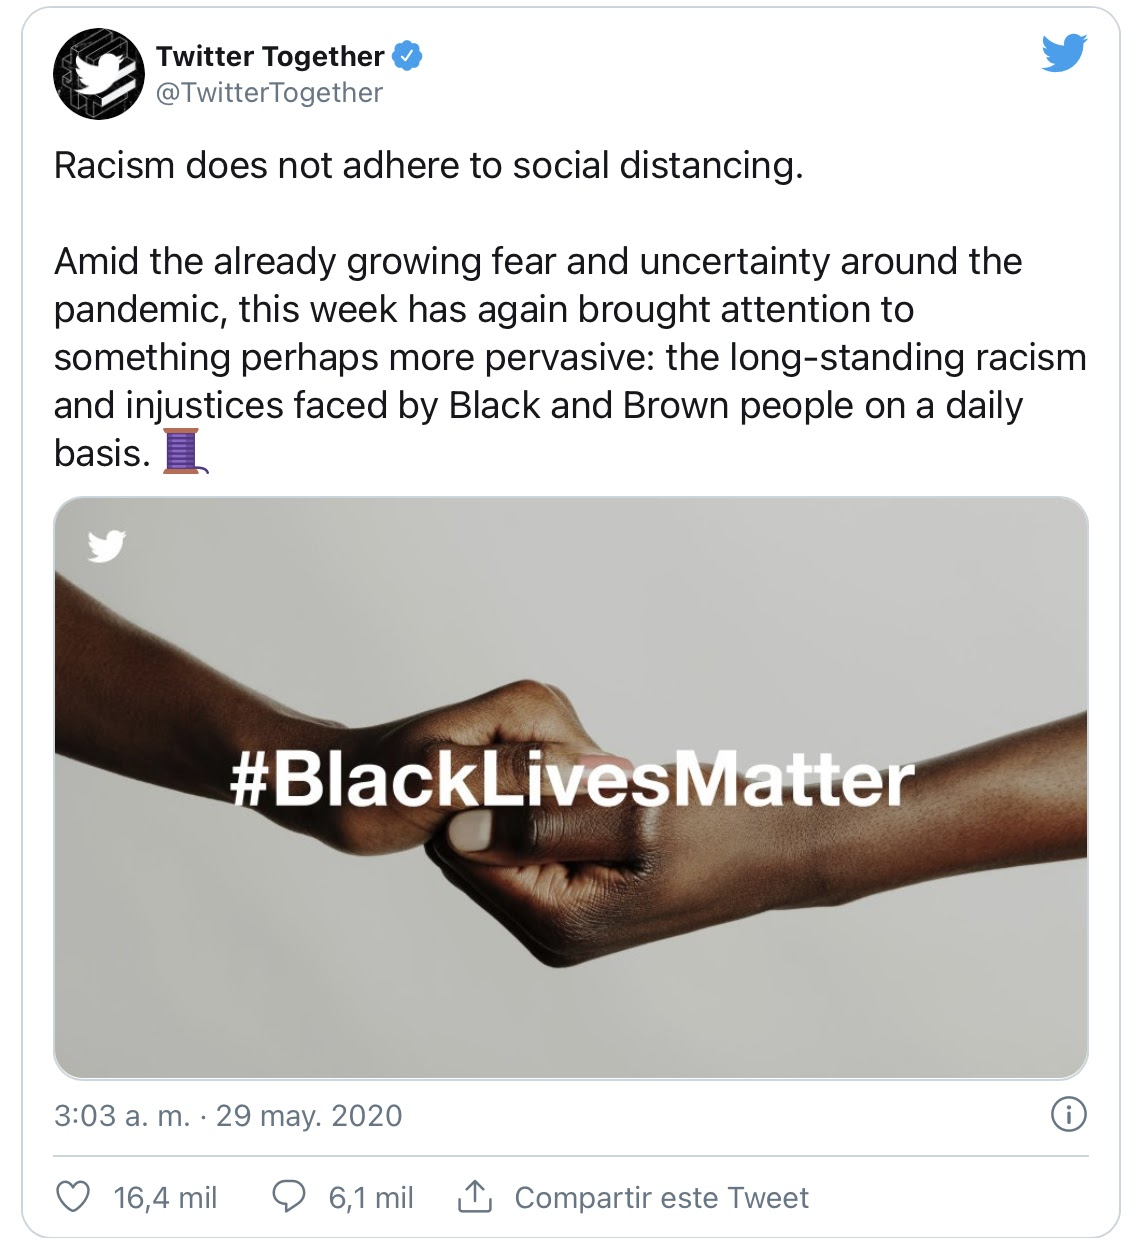 Newsjacking ejemplos